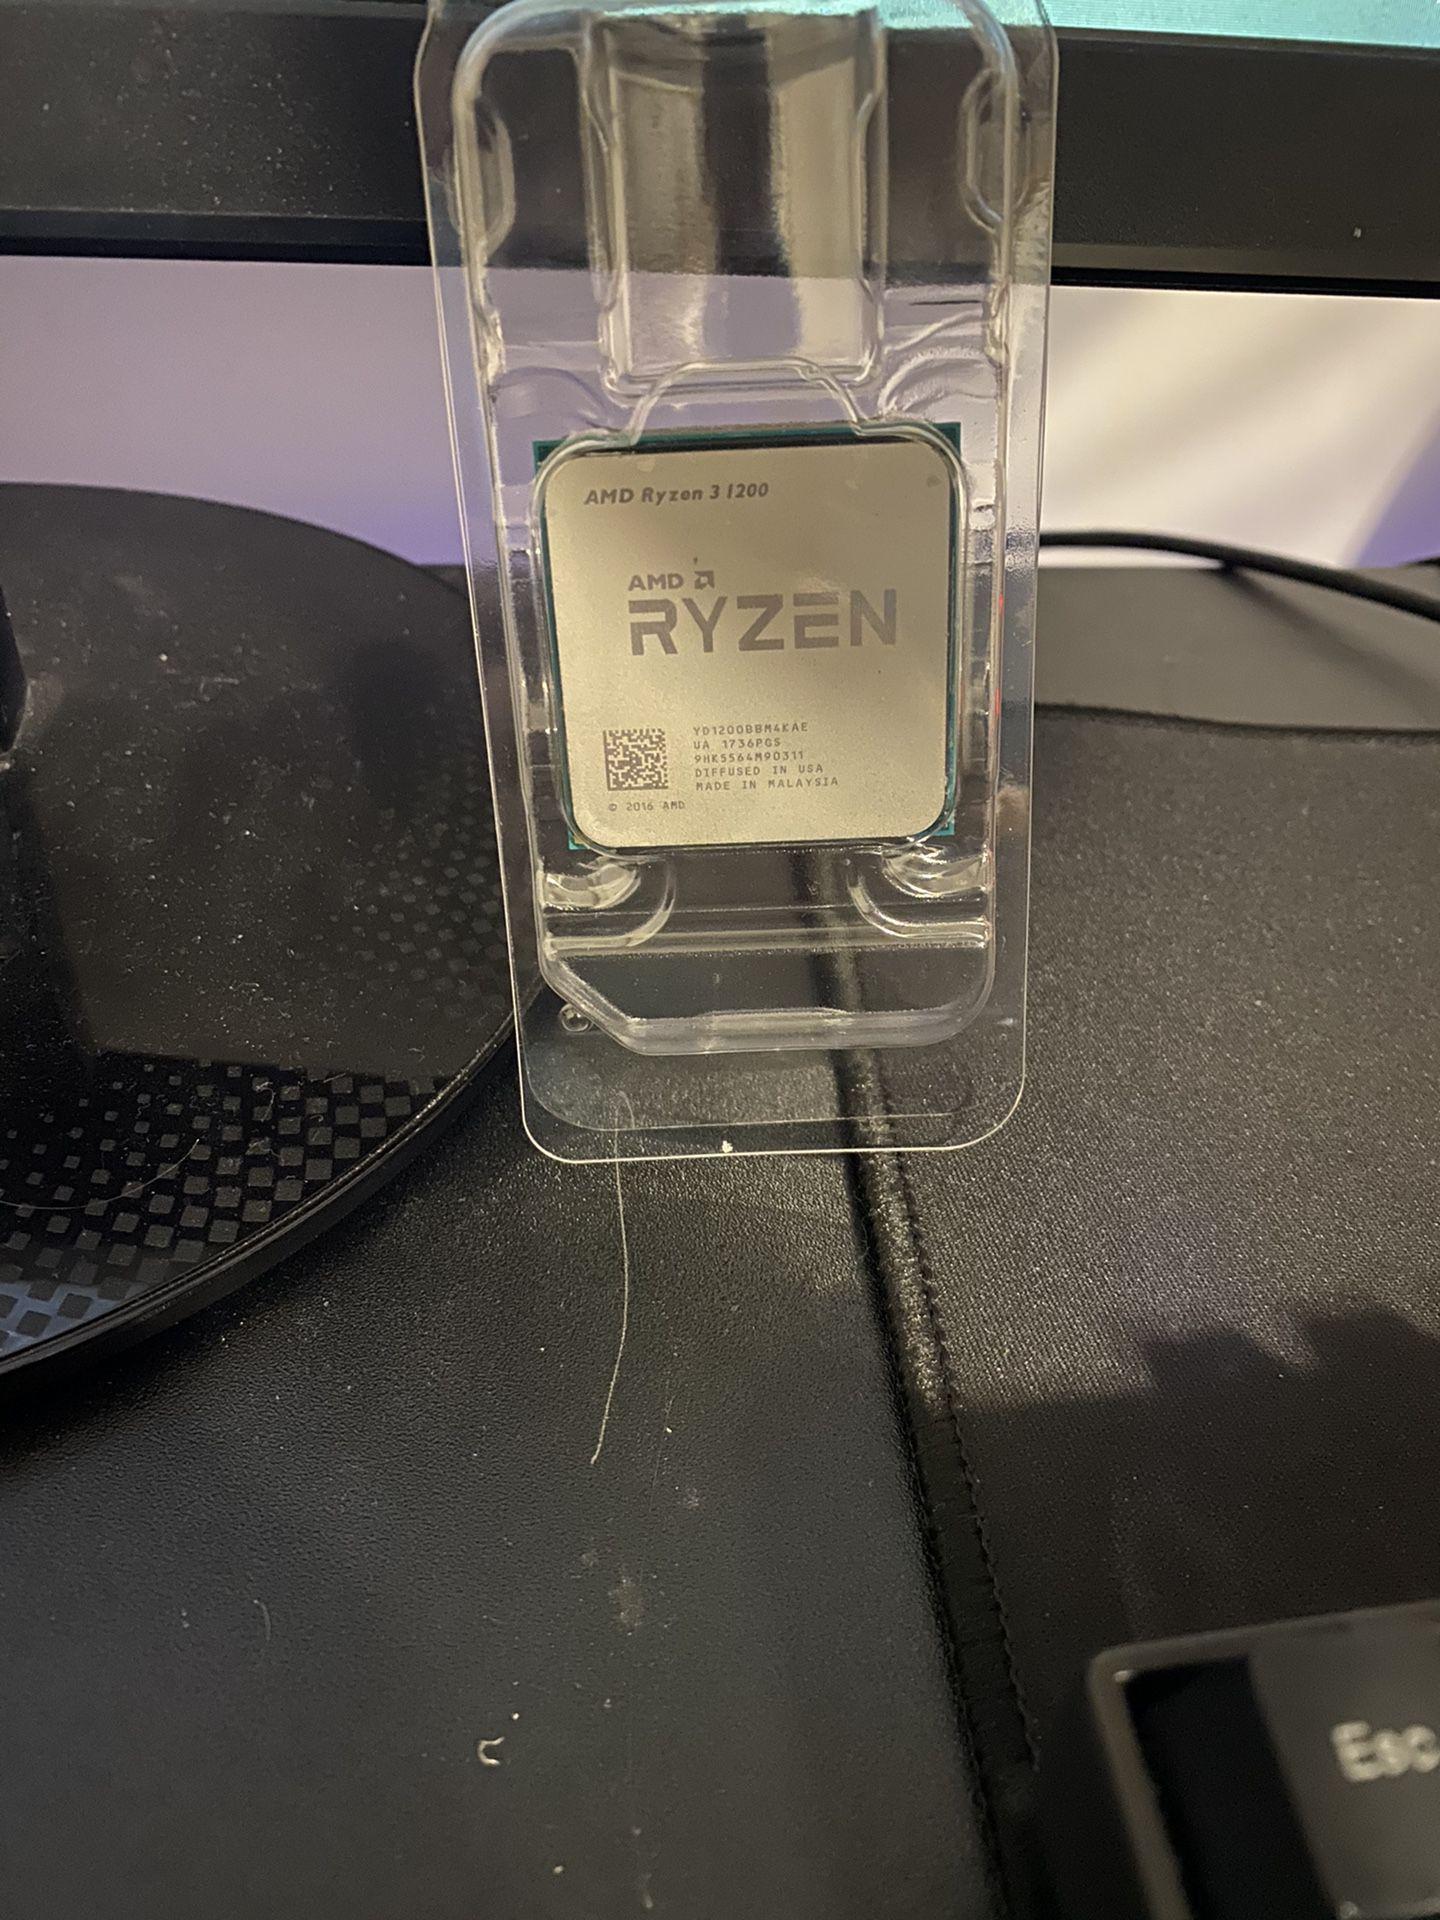 Ryzen 3 1200 with cooler master cooler